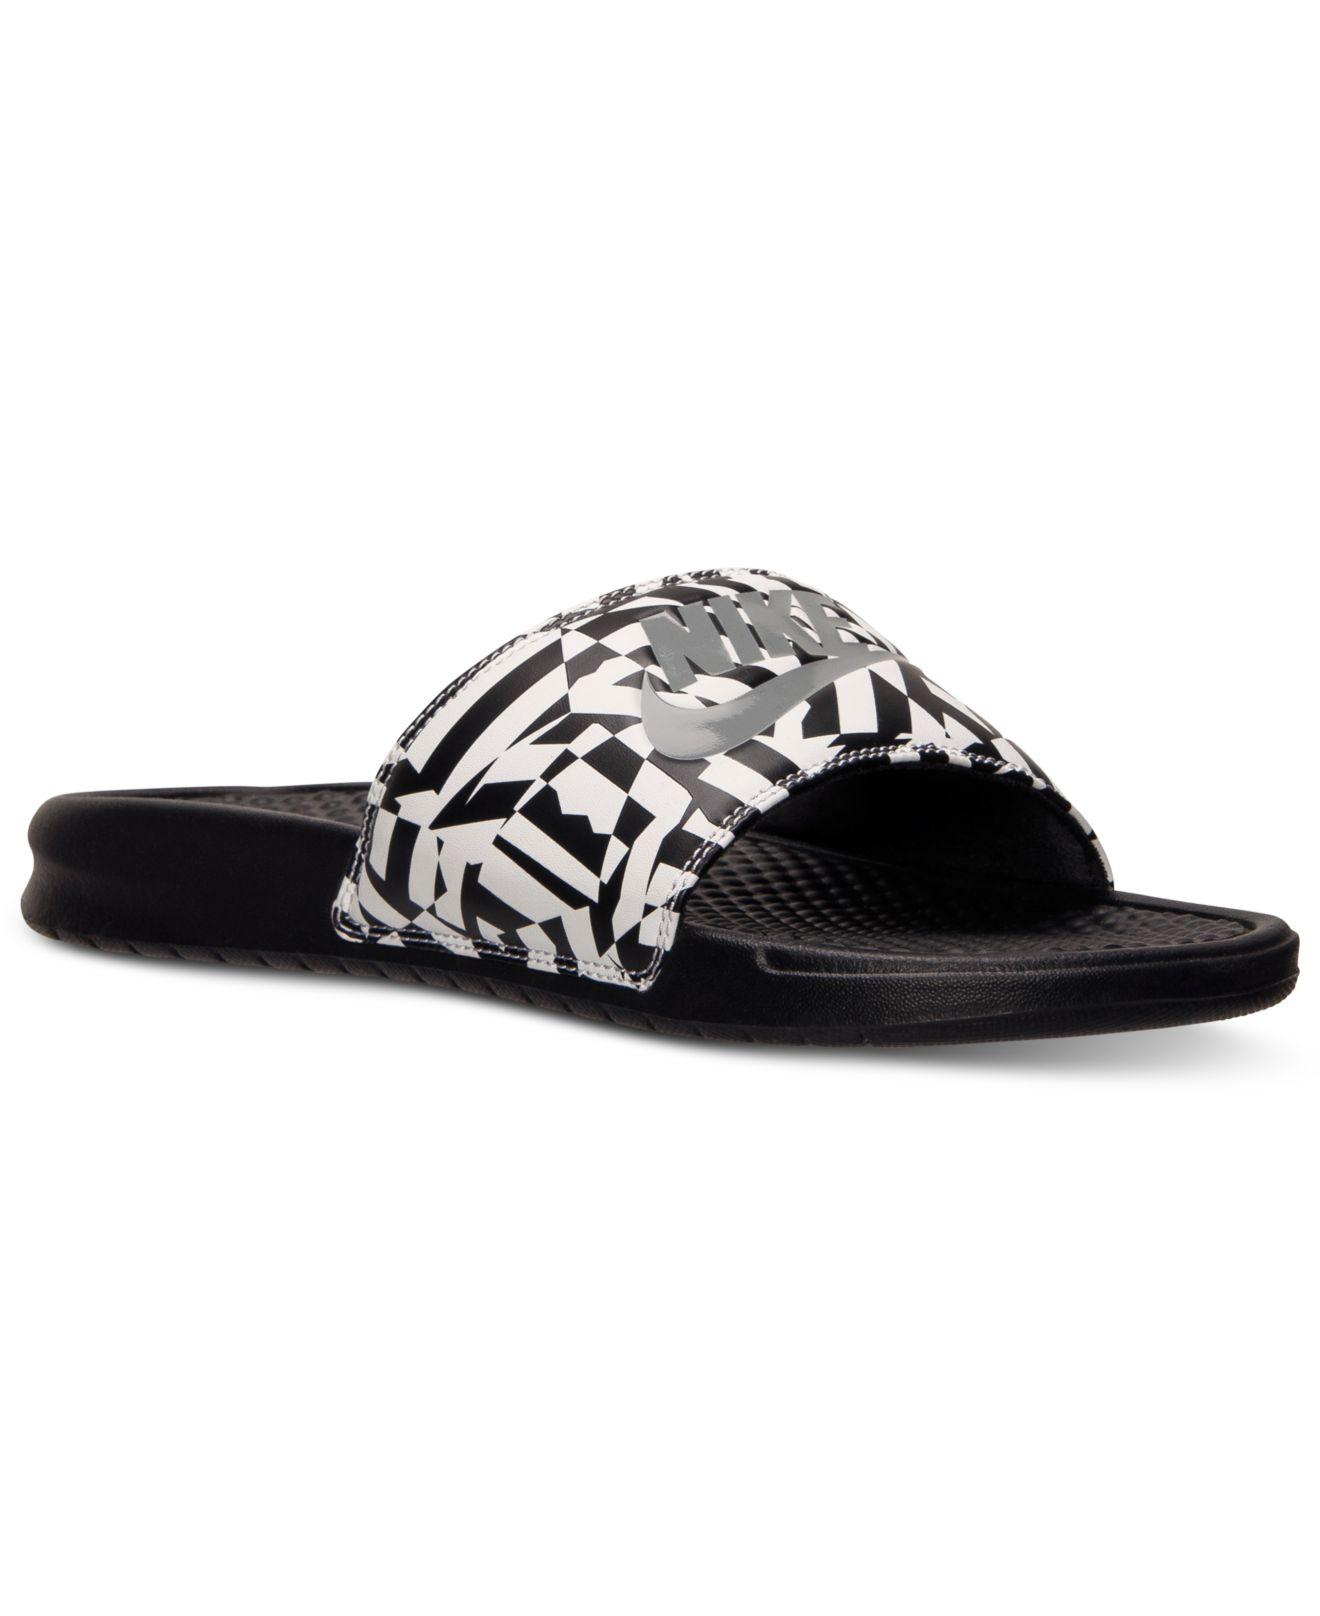 07eb27ec17ce Lyst - Nike Men S Benassi Jdi Print Slide Sandals From Finish Line ...